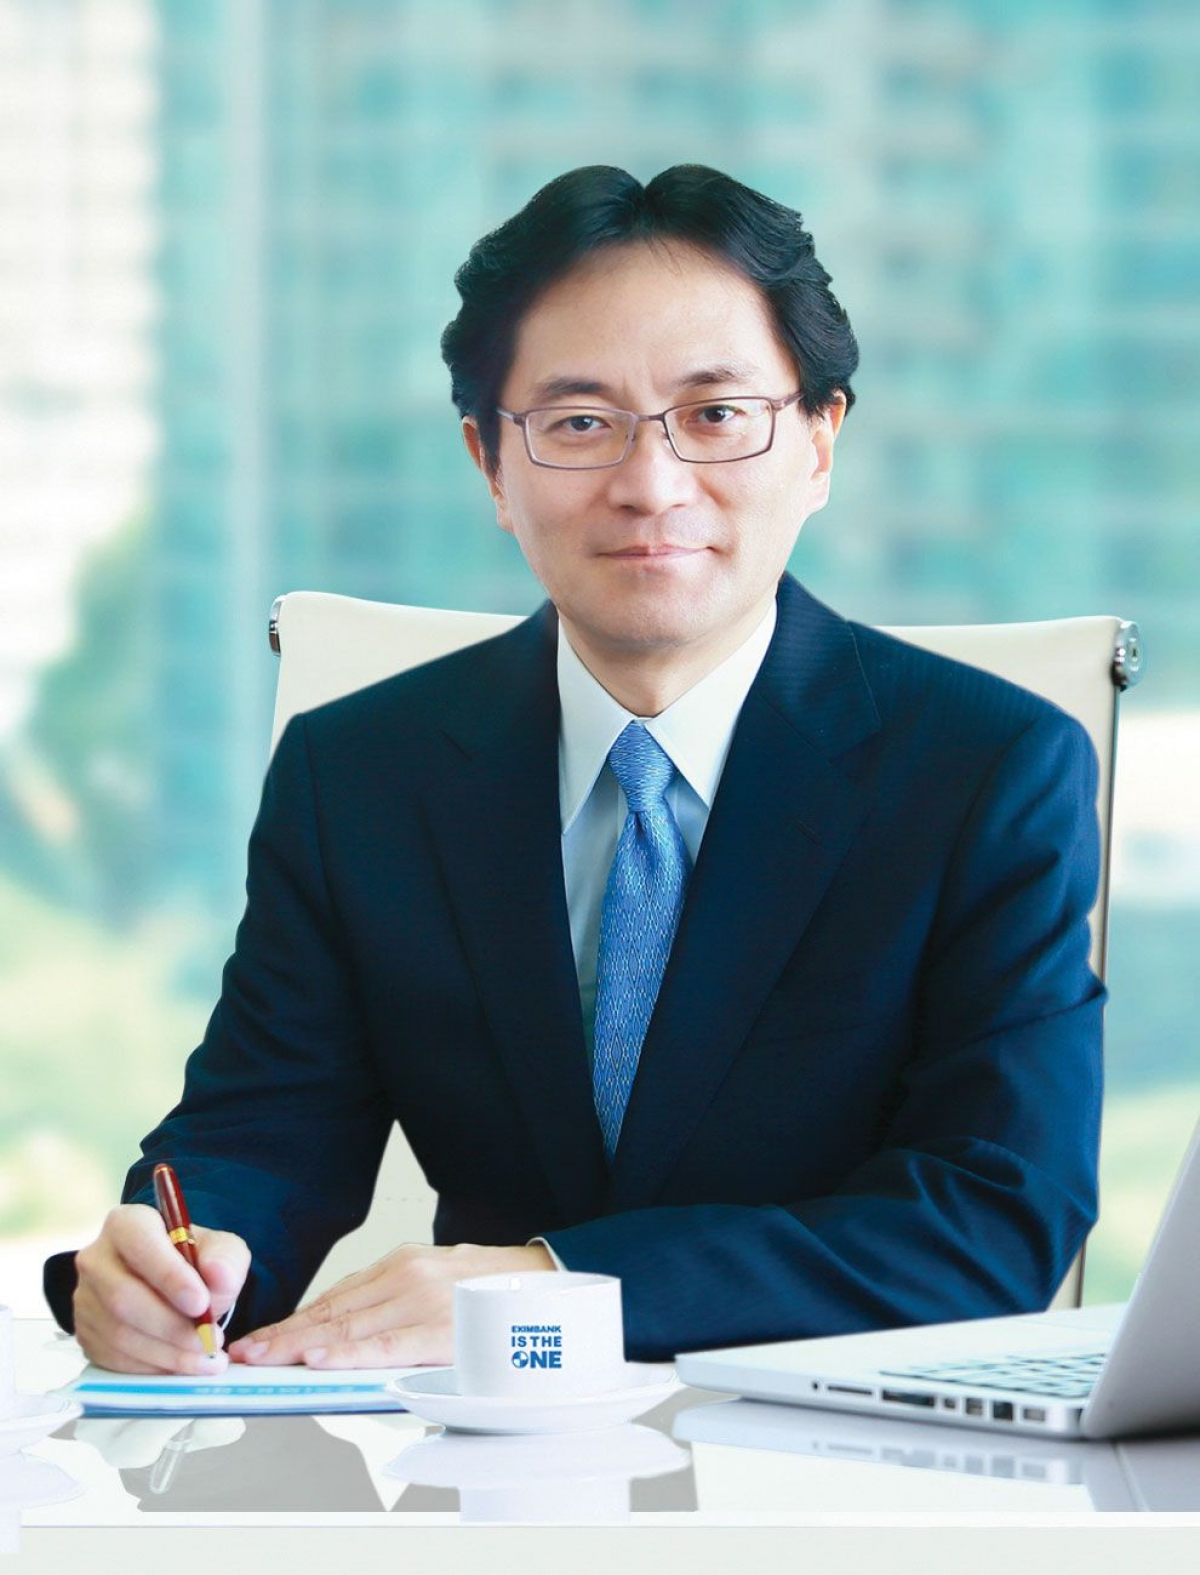 Ông Yasuhiro Saitoh (nguồn: Eximbank.com.vn)